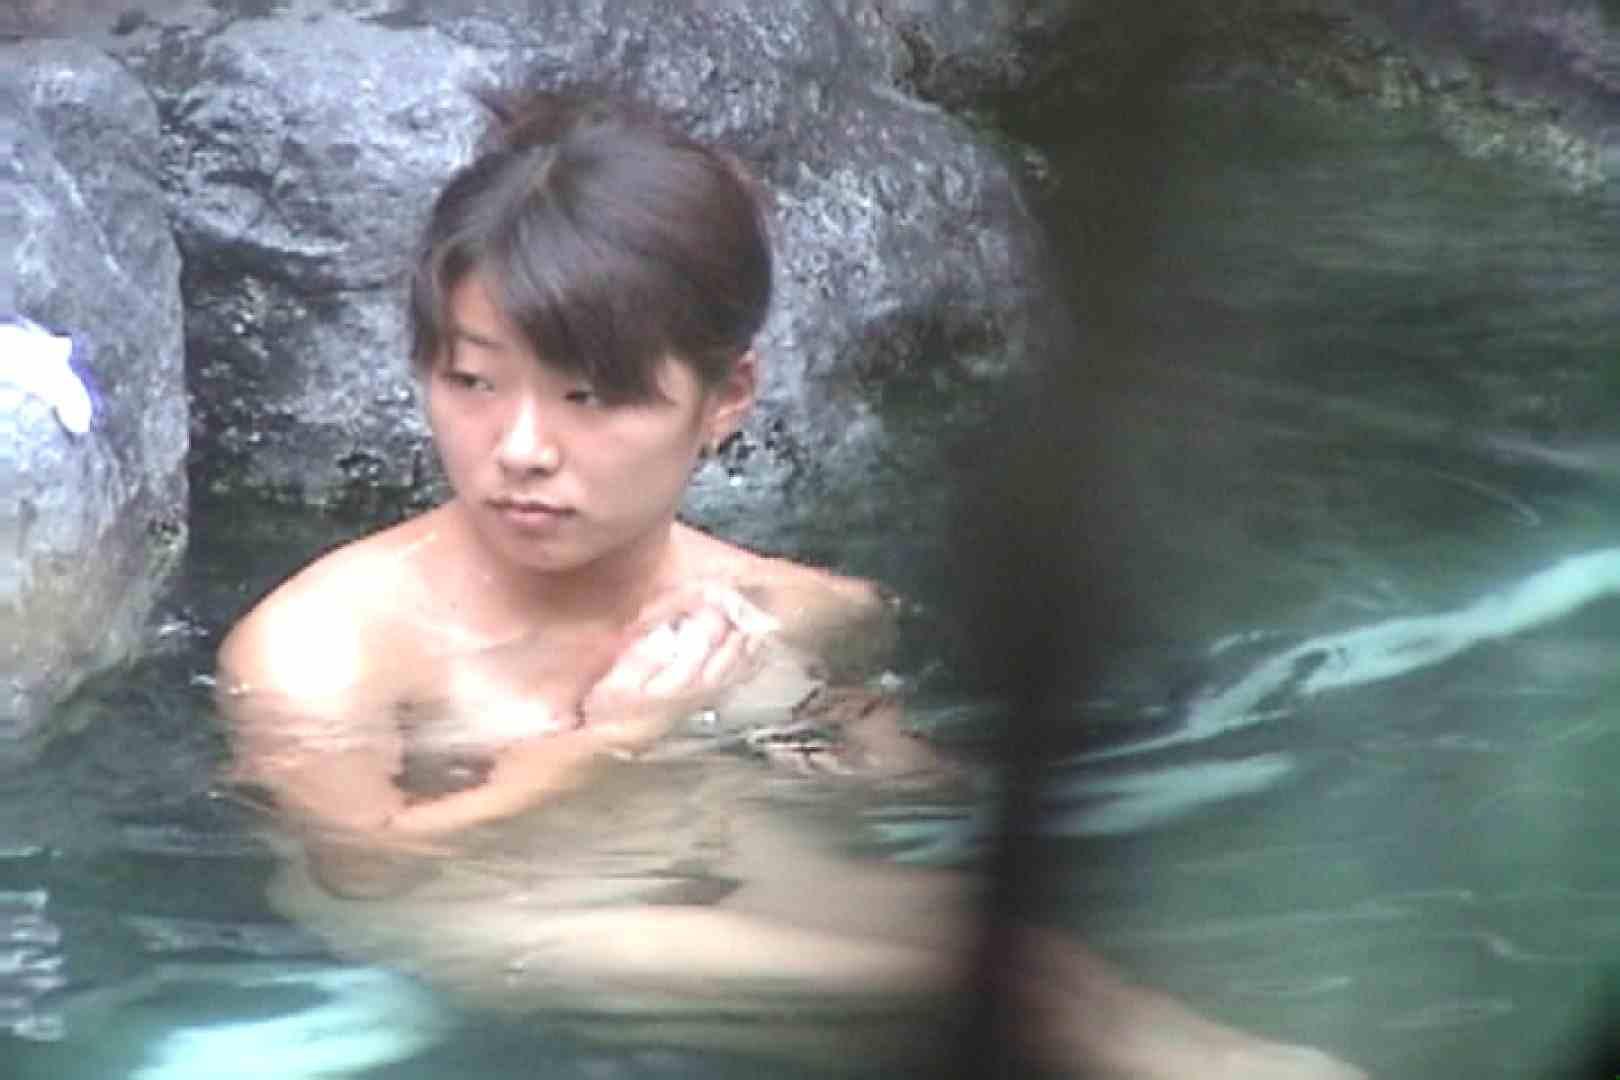 Aquaな露天風呂Vol.69【VIP限定】 OLのエロ生活   露天風呂  106連発 49